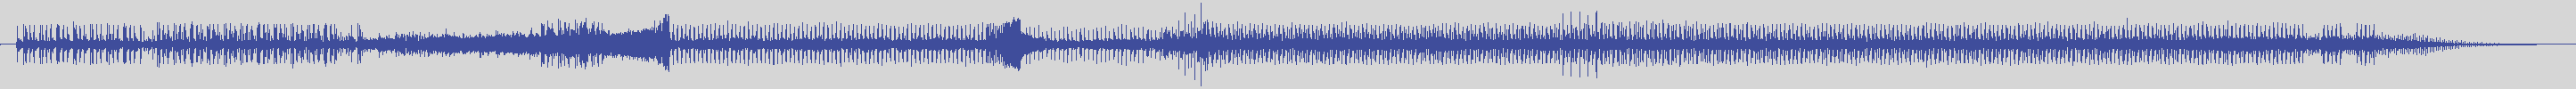 just_digital_records [JS1186] Malden - Another Side [Original Mix] audio wave form